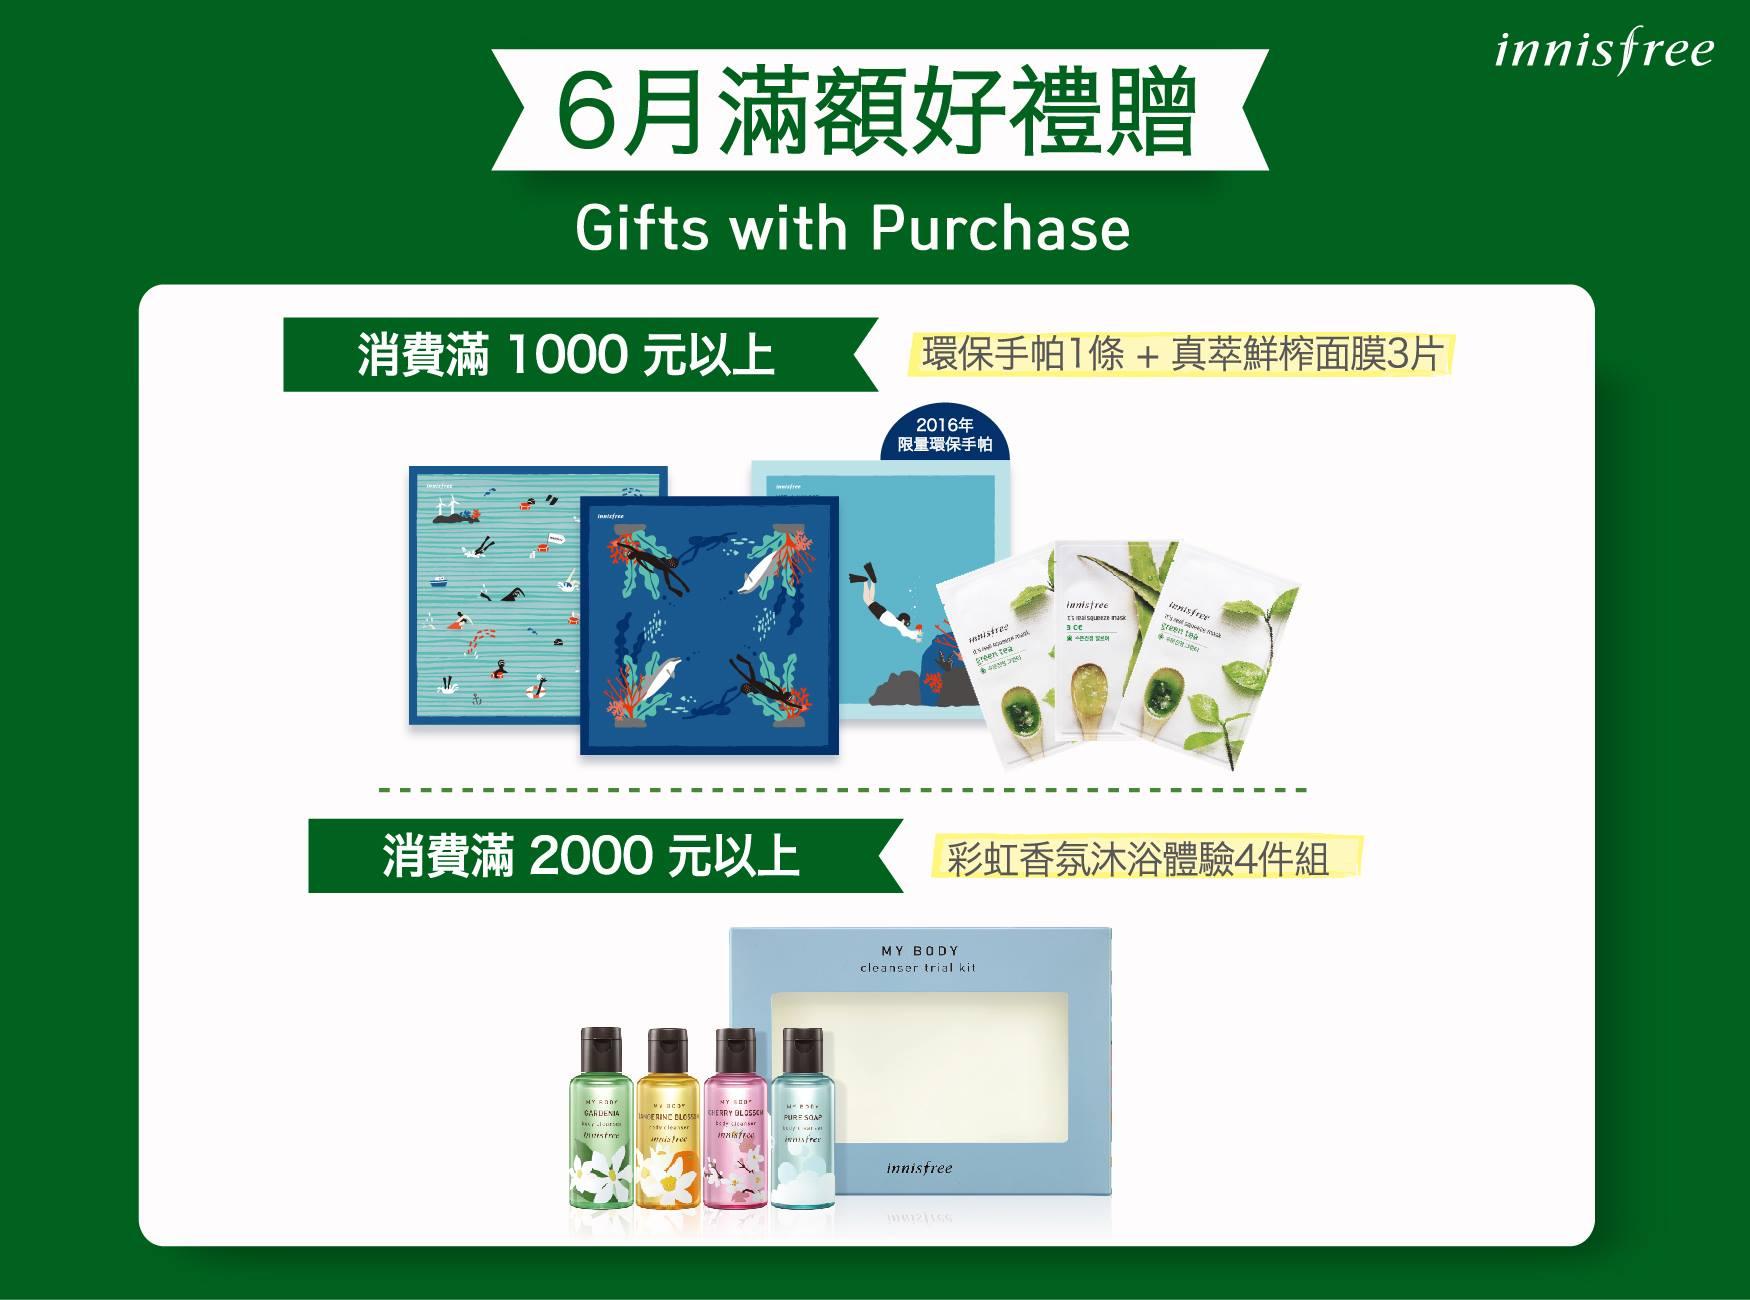 Innisfree每年都會推出限定版環保手帕,現在只要消費滿1000元就可以拿到,錯過這個月就要等明年啦!(註:環保手帕每人限領一條,限量送完為止)